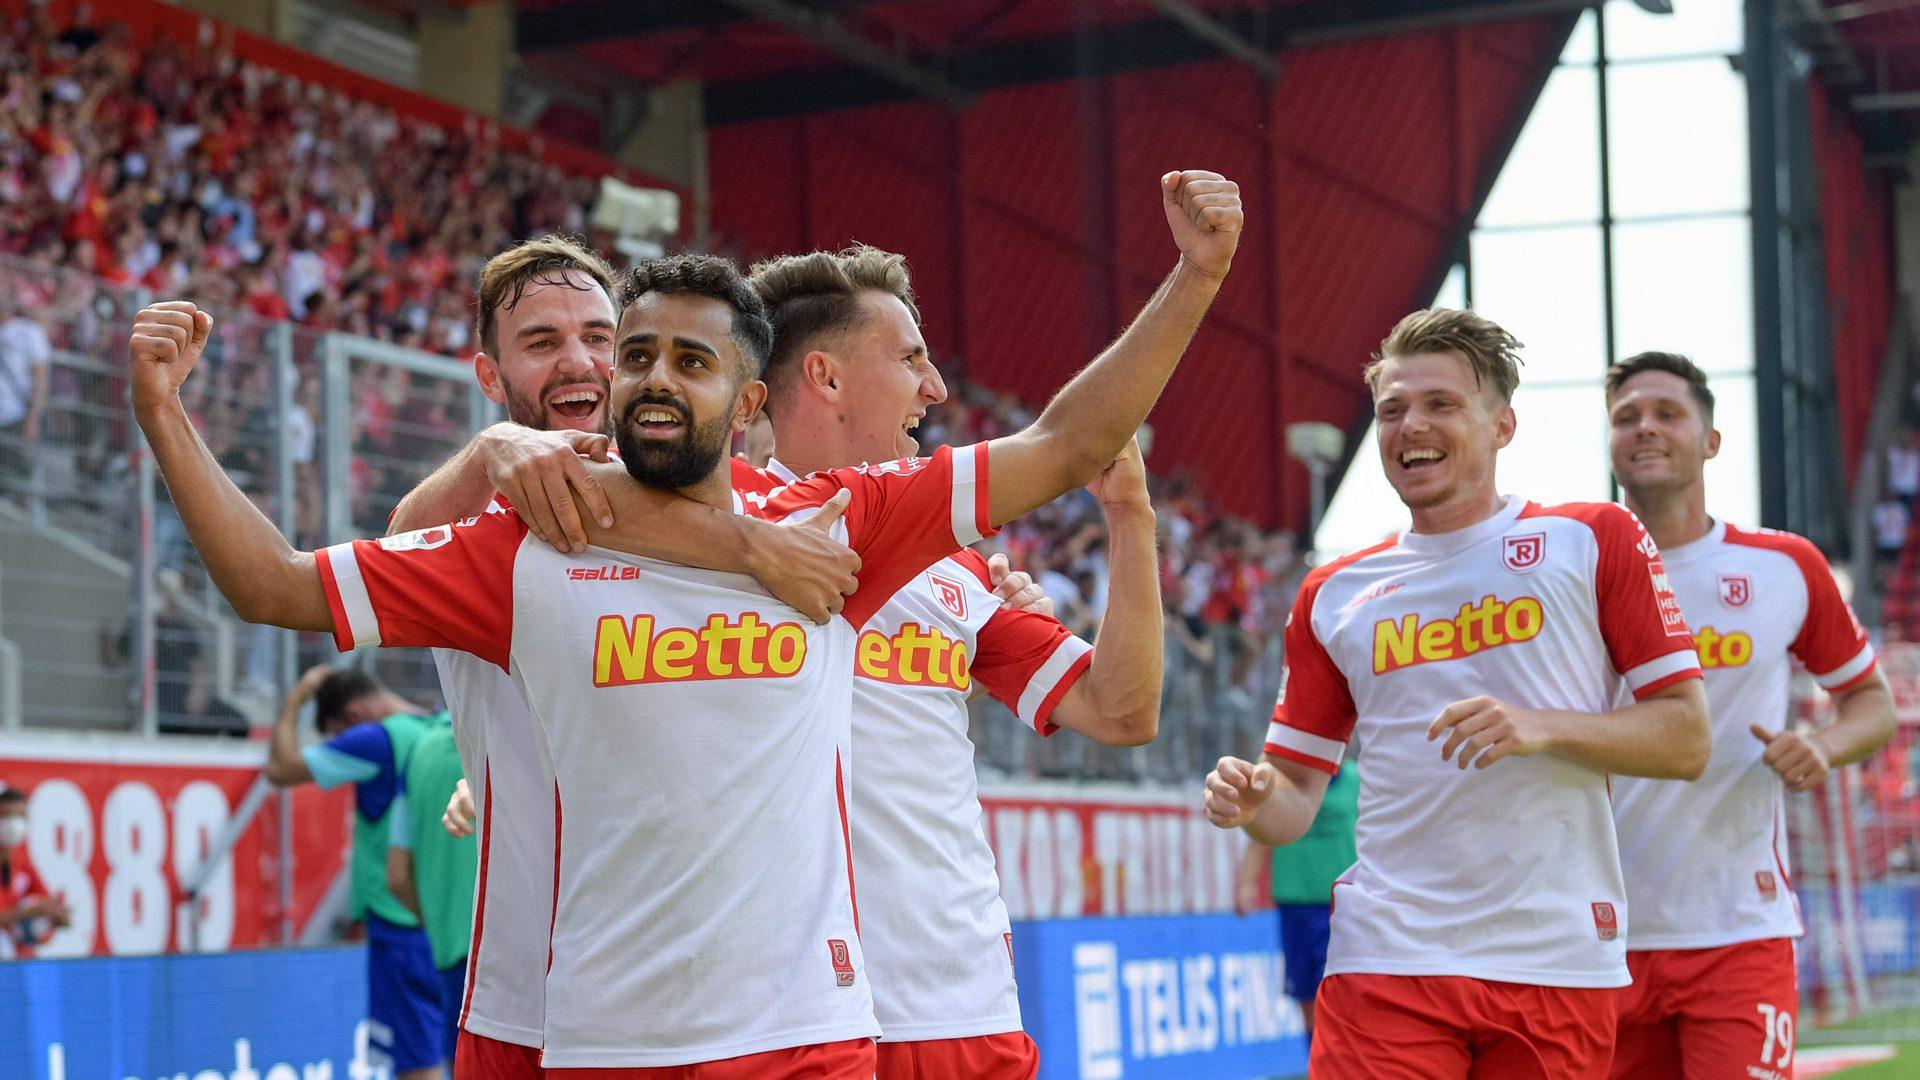 Singh when you're winning: Sarpreet leading Jahn Regensburg's charge | 2. Bundesliga